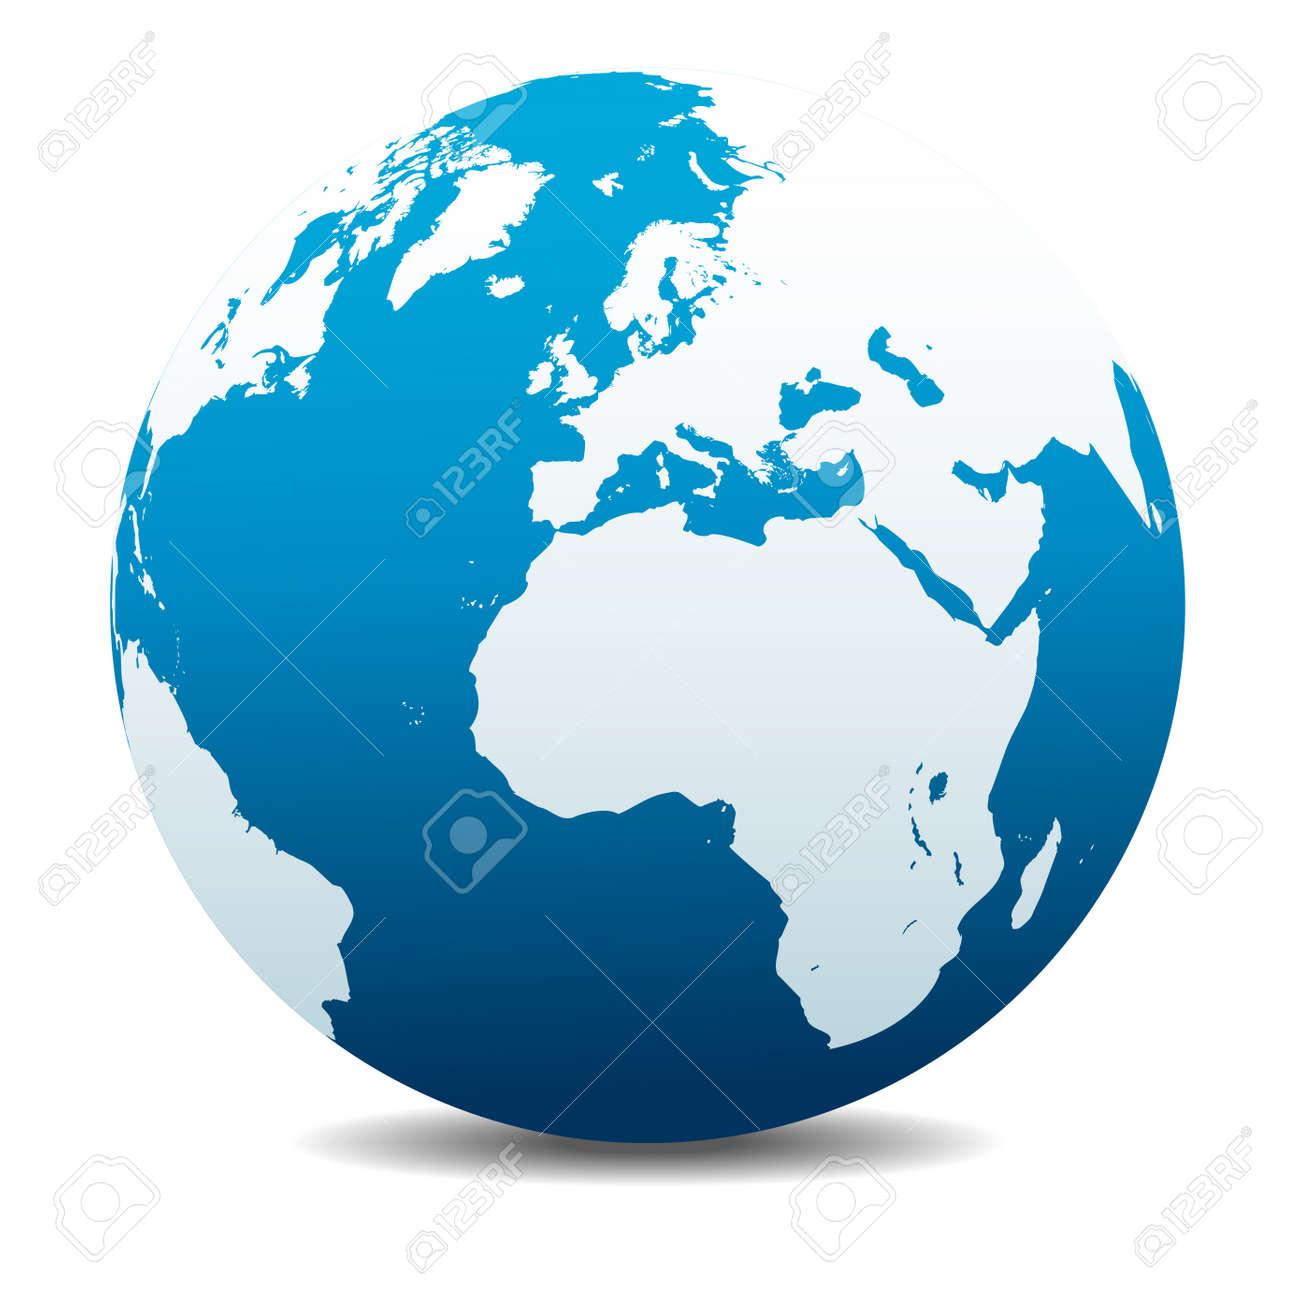 Europe and Africa, Global World - 48970281